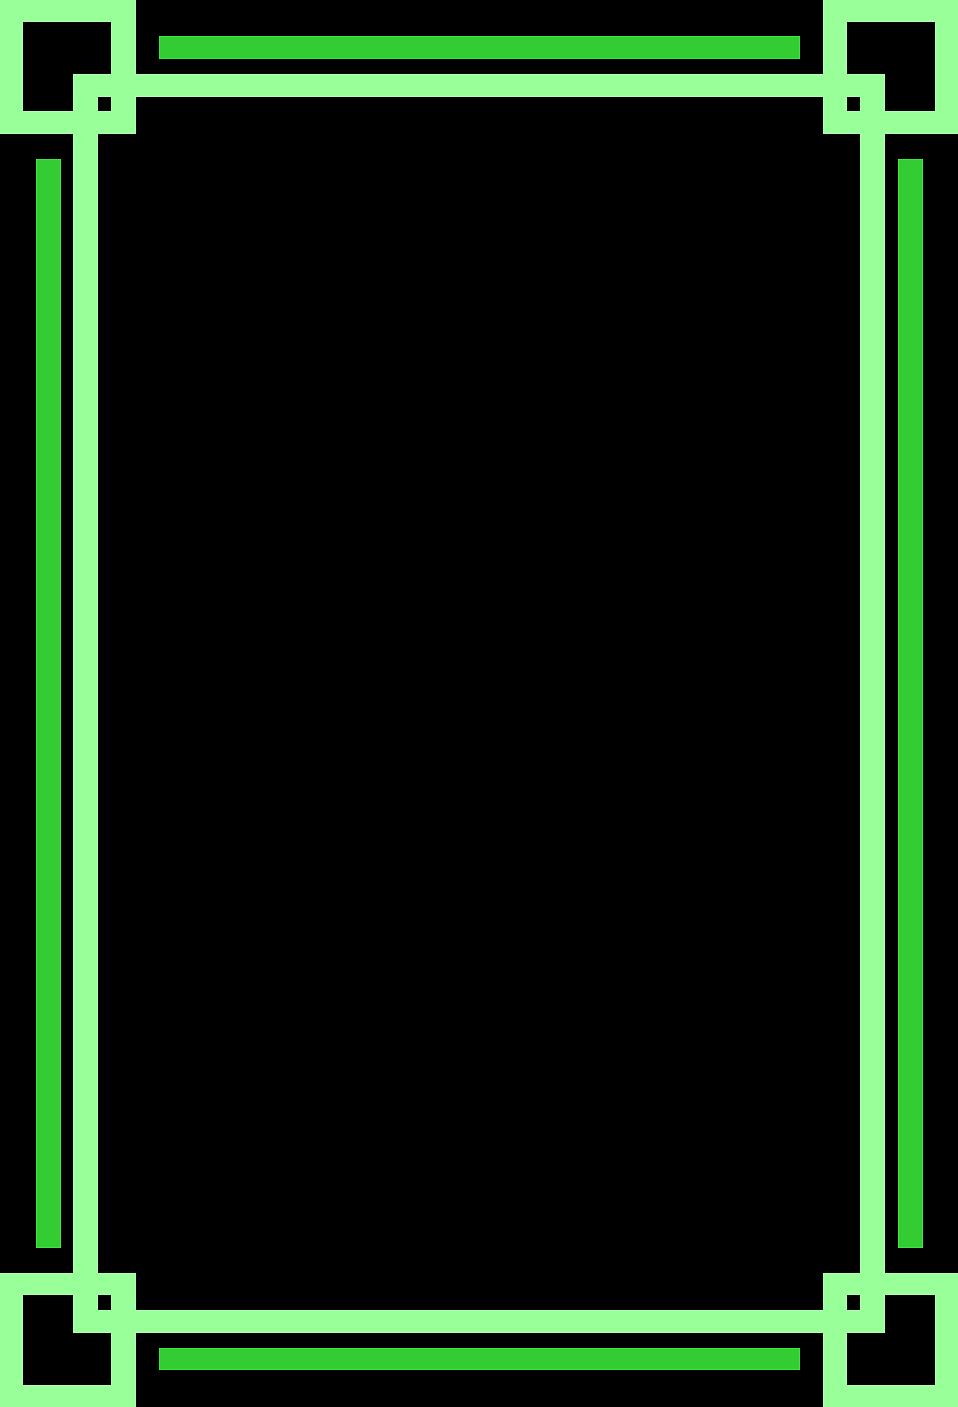 Border Green Free Stock Photo Illustration Of A Blank Green Frame ...